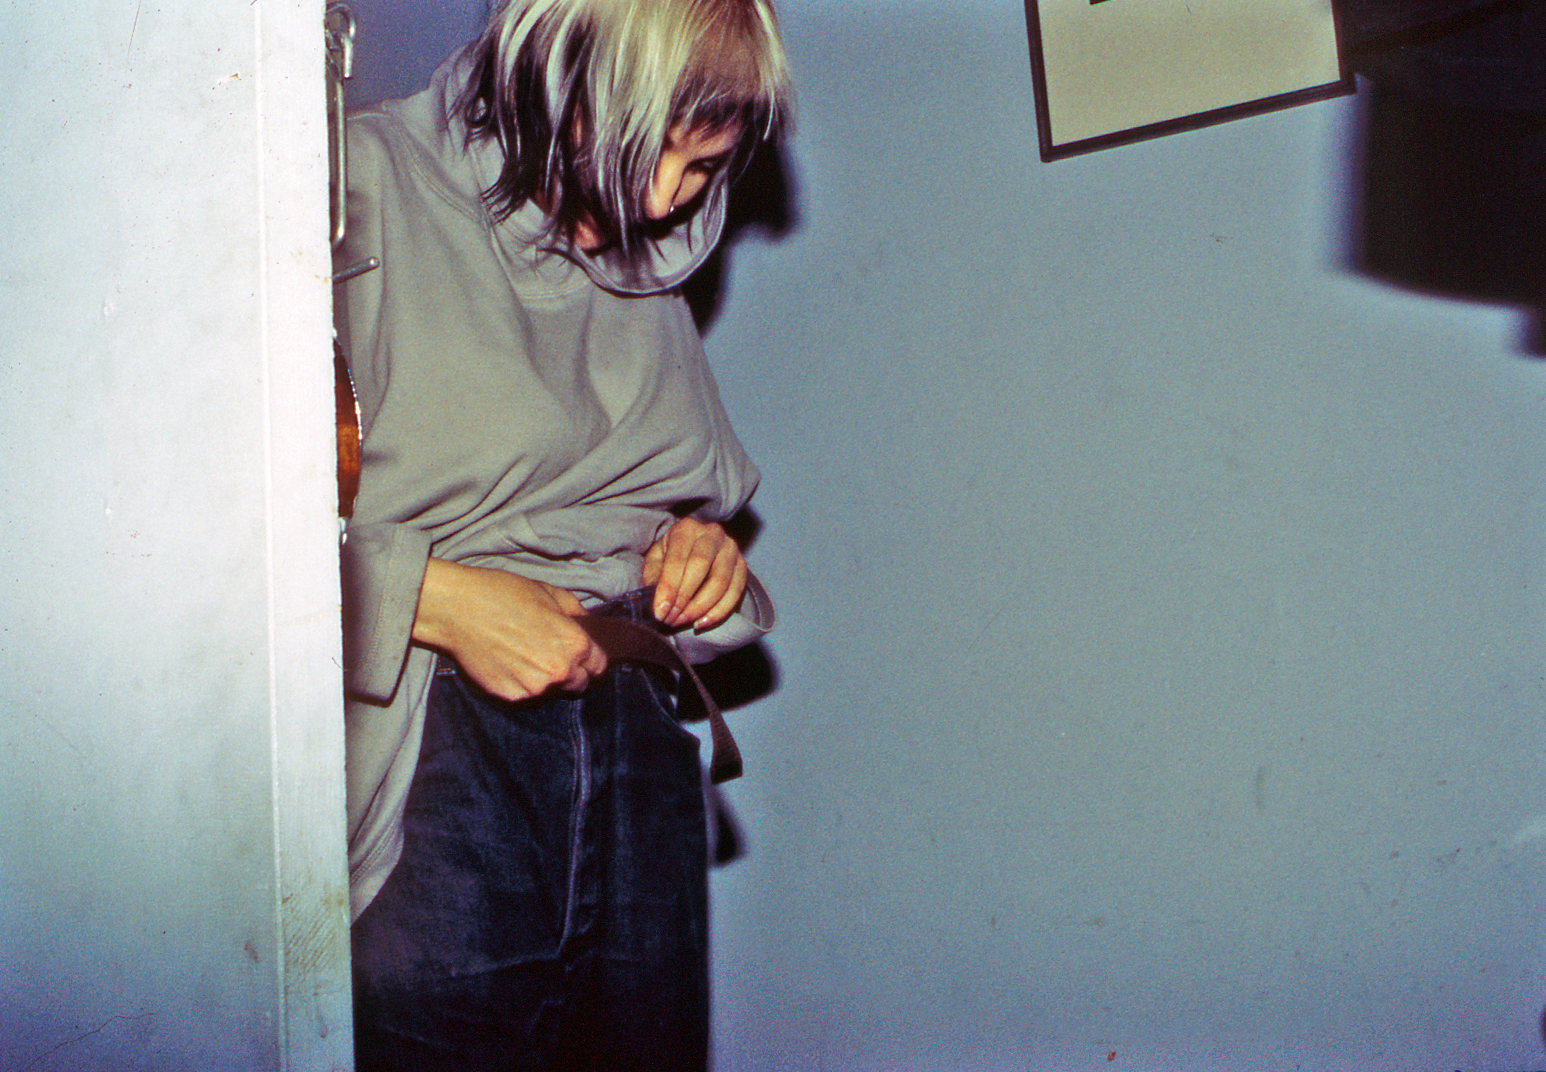 loewendahl-atomic-photobooth-06.jpg